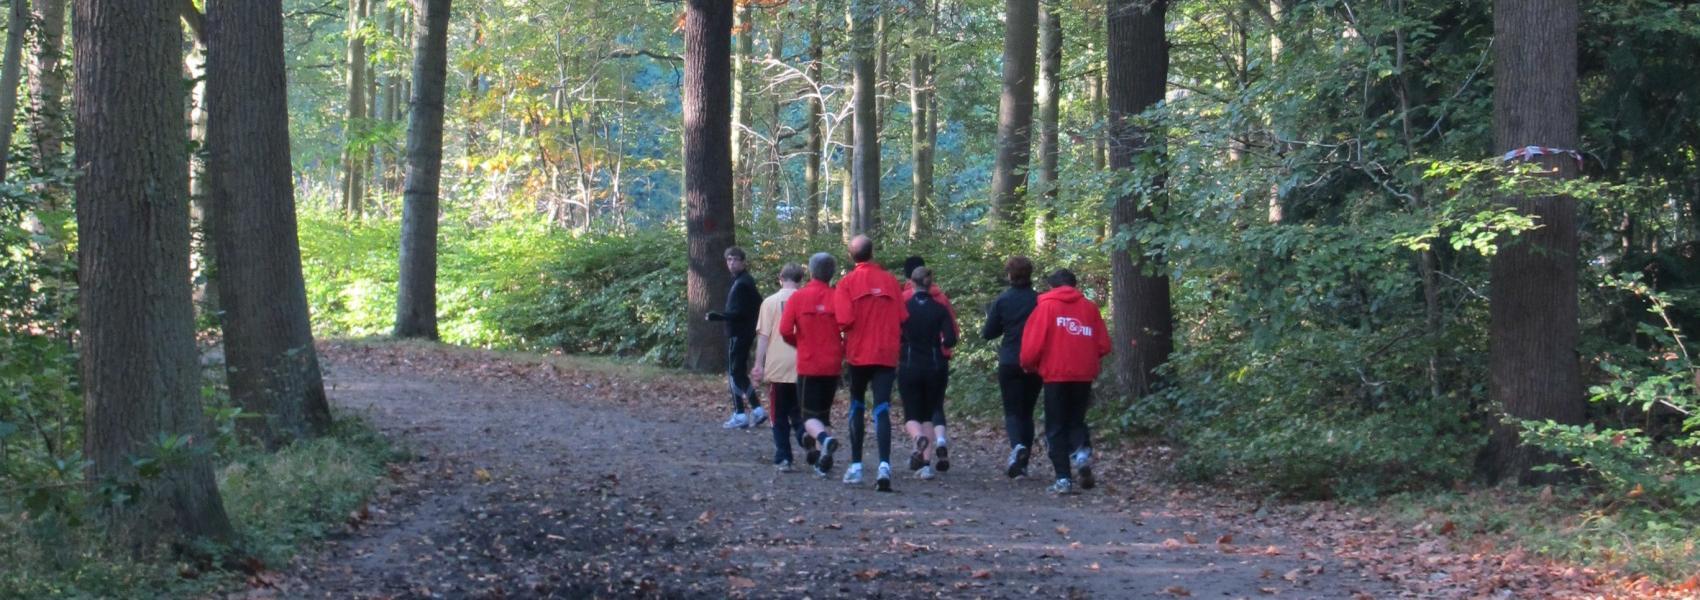 joggers in het bos